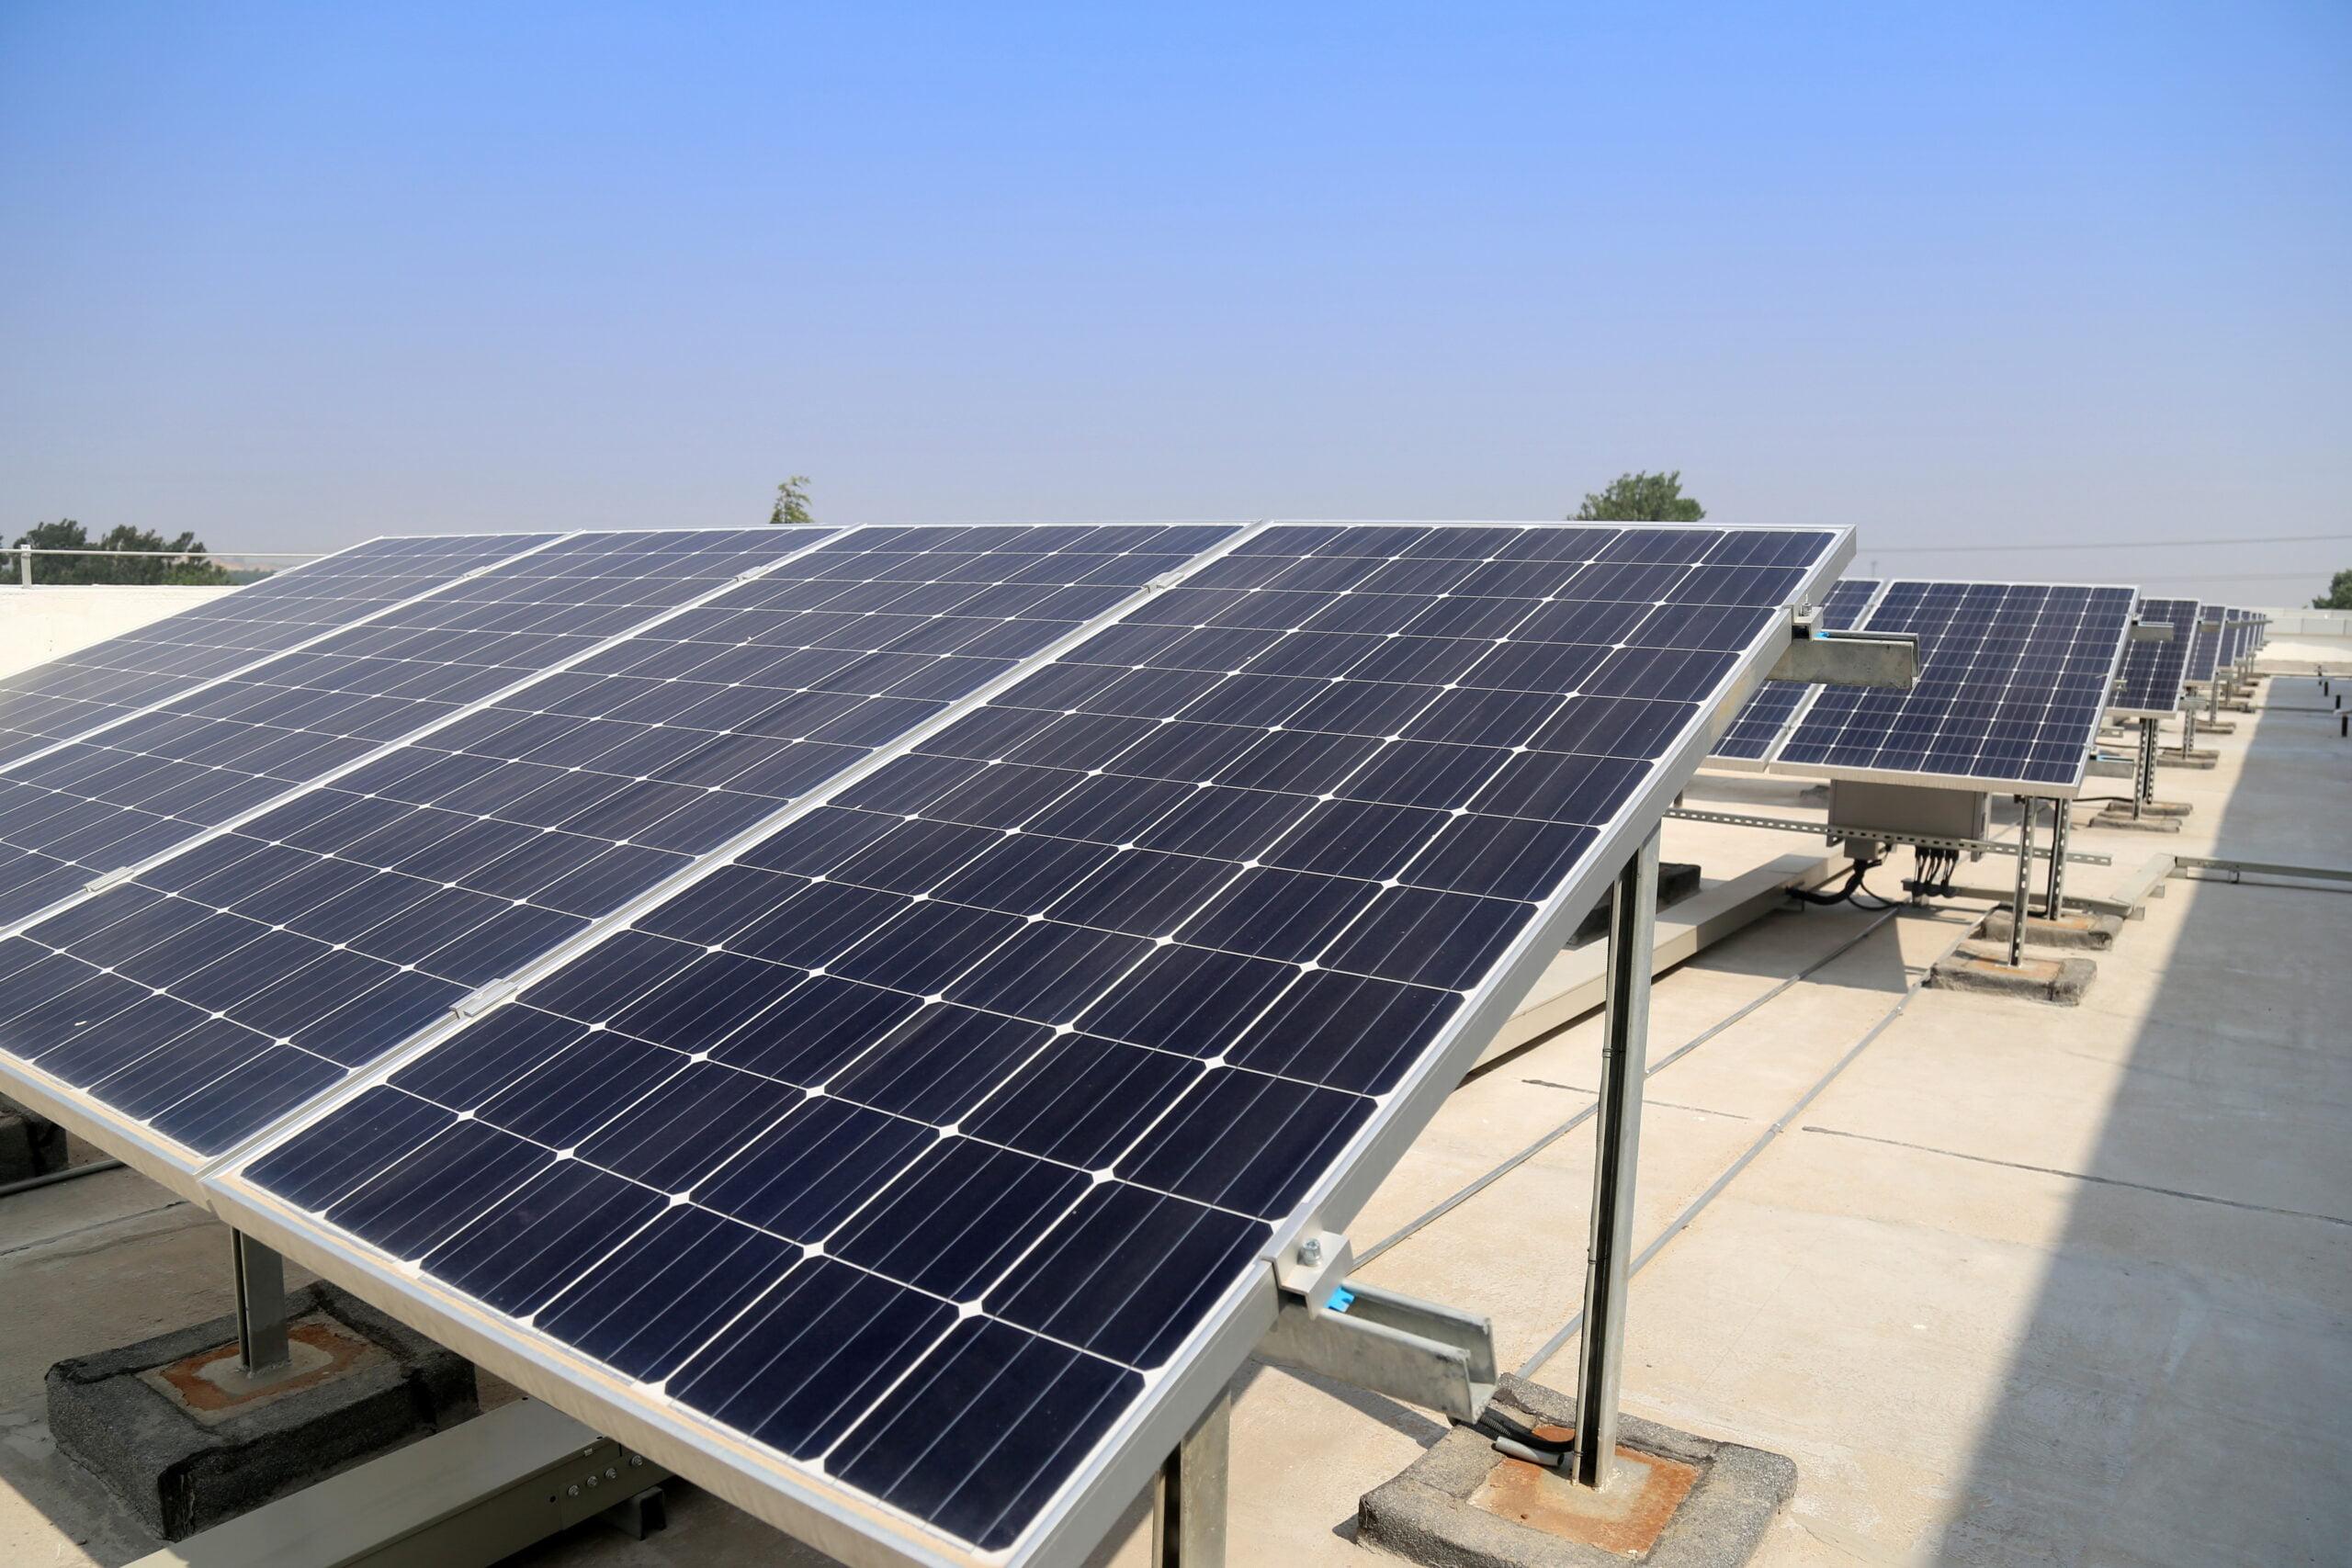 solar-power-power-station-scaled.jpg